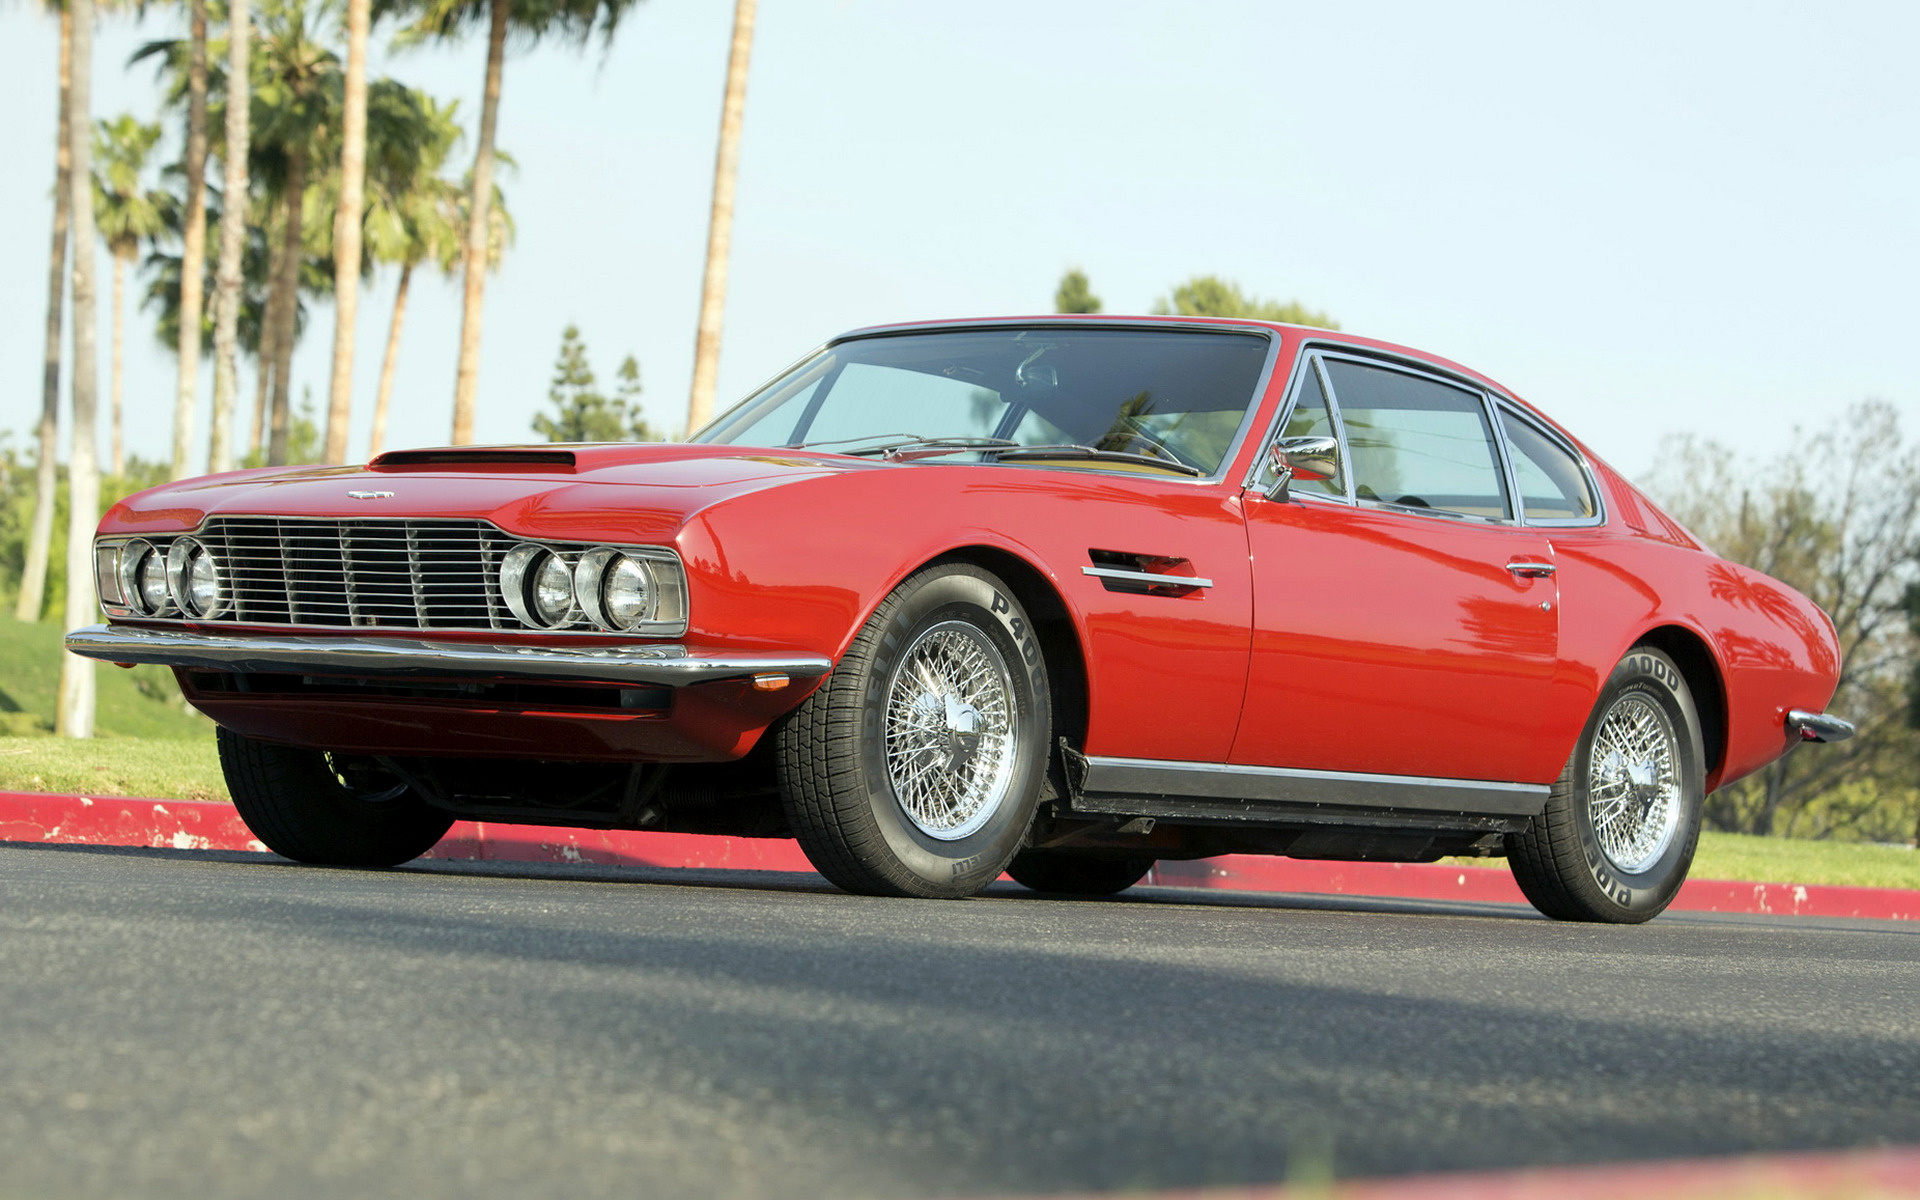 Aston Martin DBS Vantage US Wallpapers And HD Images Car Pixel - 1967 aston martin